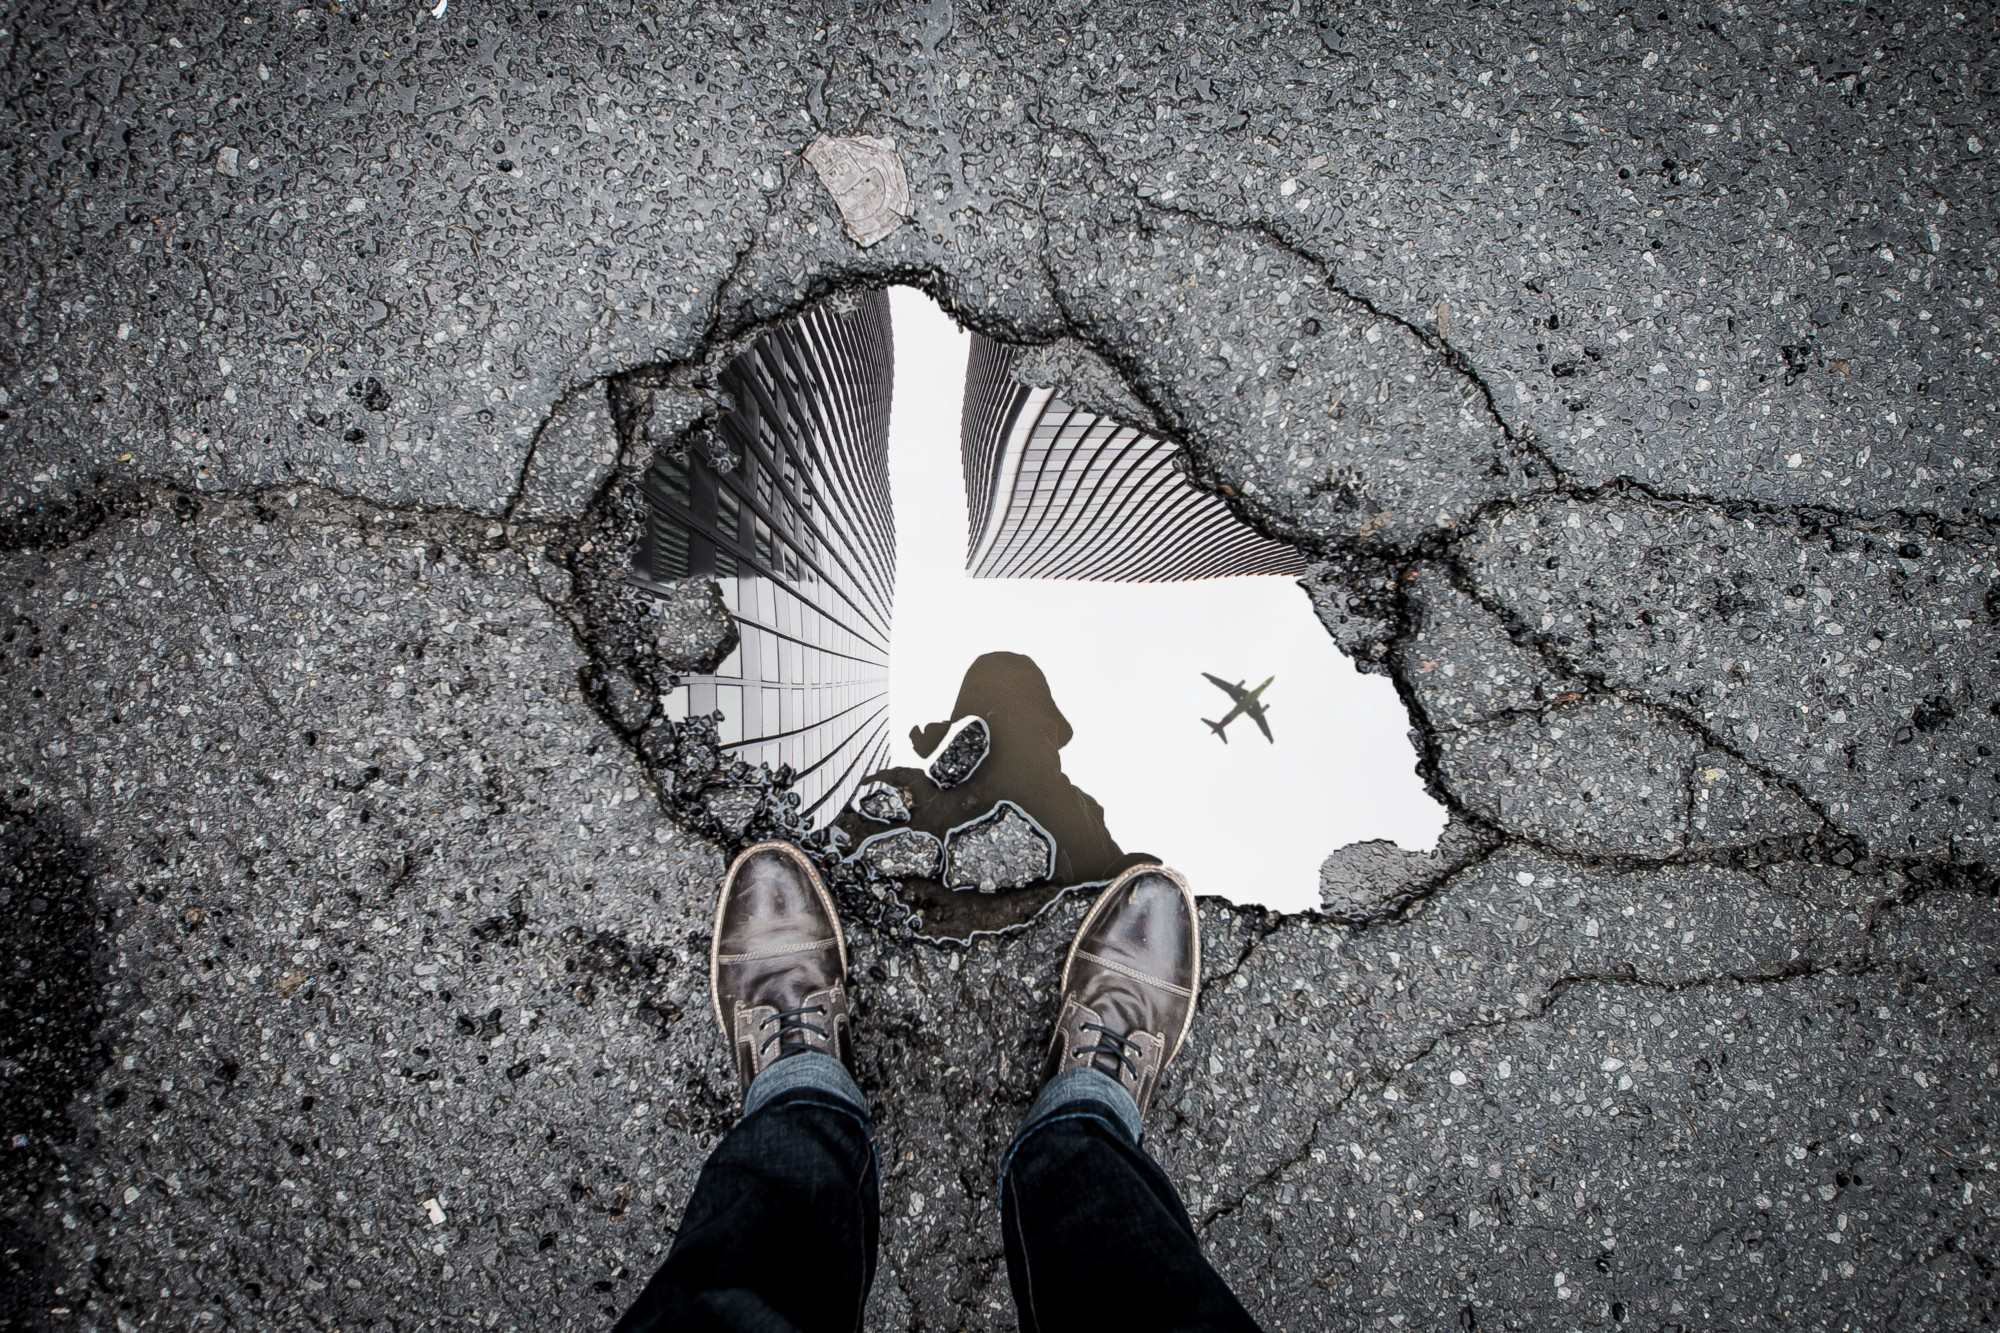 Jodoin reflections